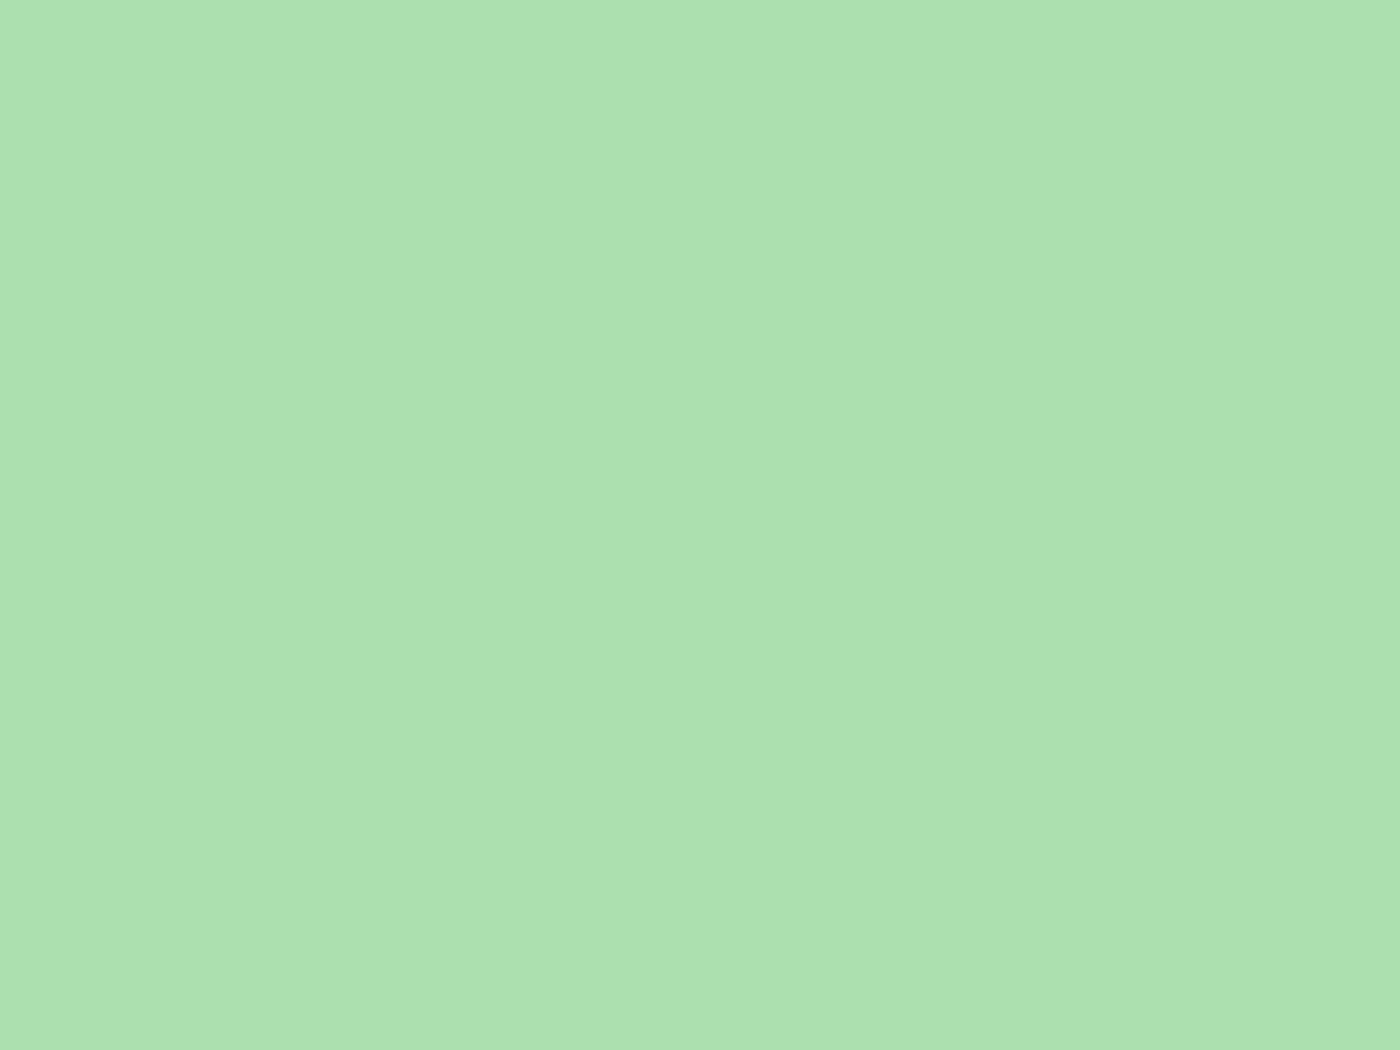 1400x1050 Celadon Solid Color Background